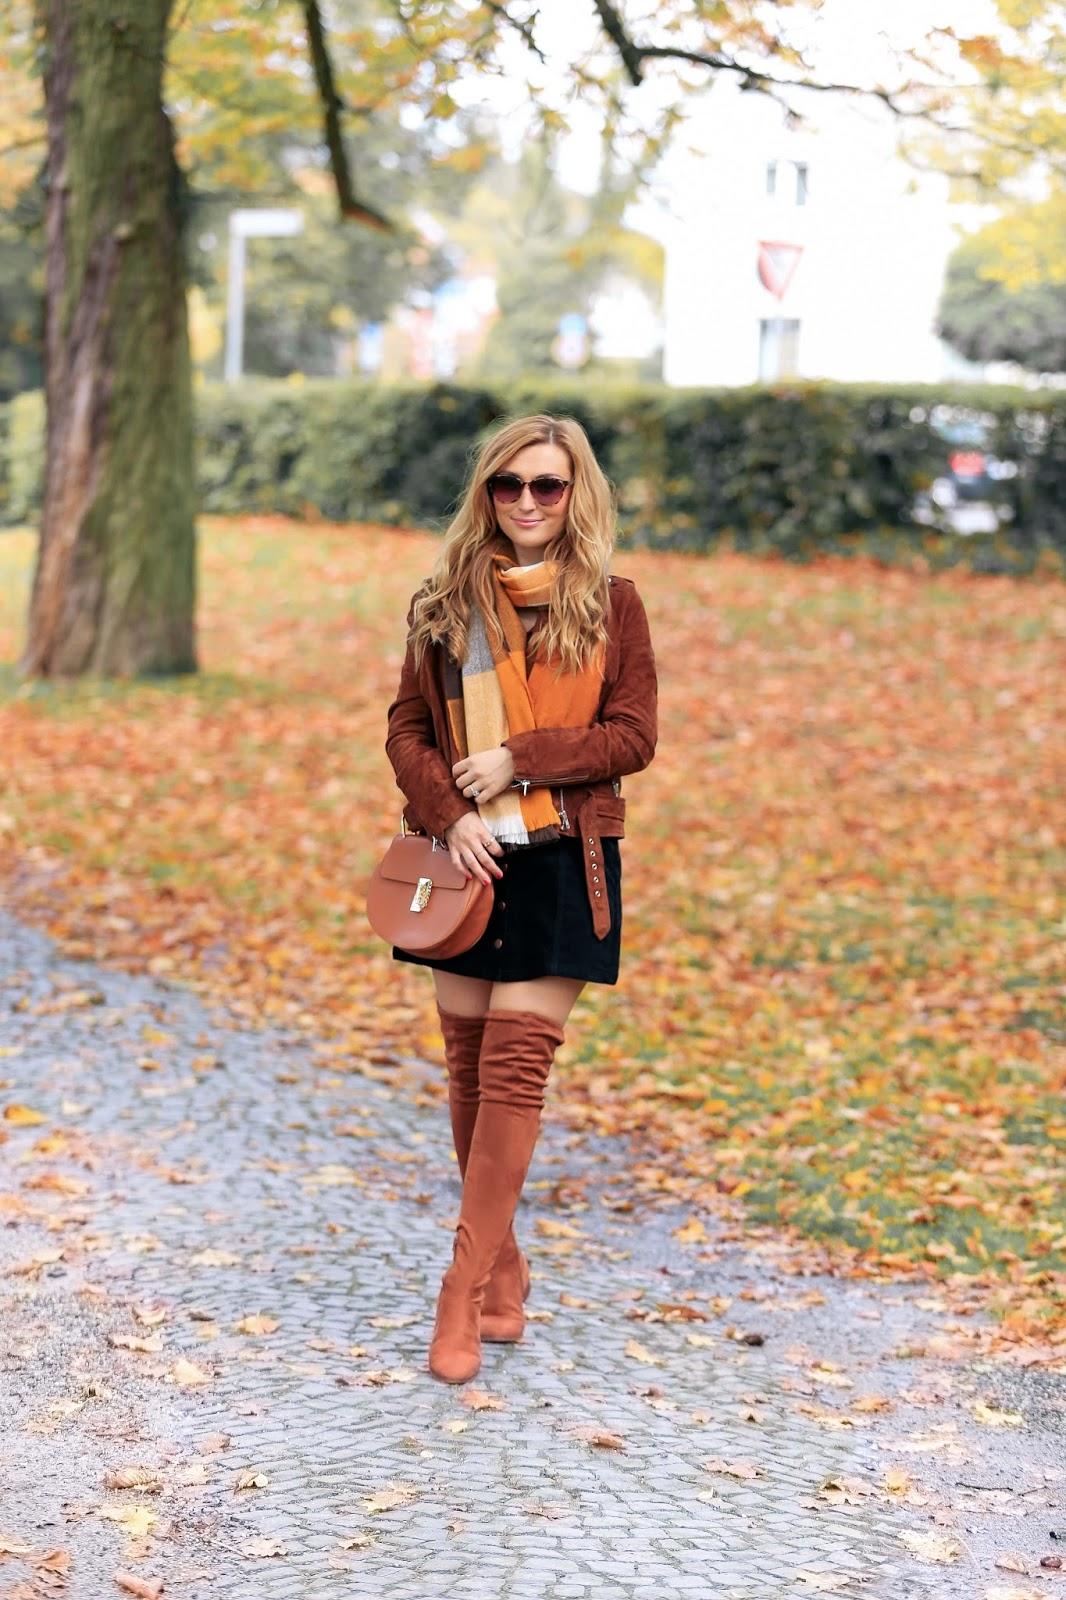 Fashionstylebyjohanna-fashionblog-Frankfurt-blogger-fashionblogger-bloggerdeutschland-lifestyleblog-modeblog-muenchen-germanblogger-styleblog-cordrock-a-la-streetwear-chic